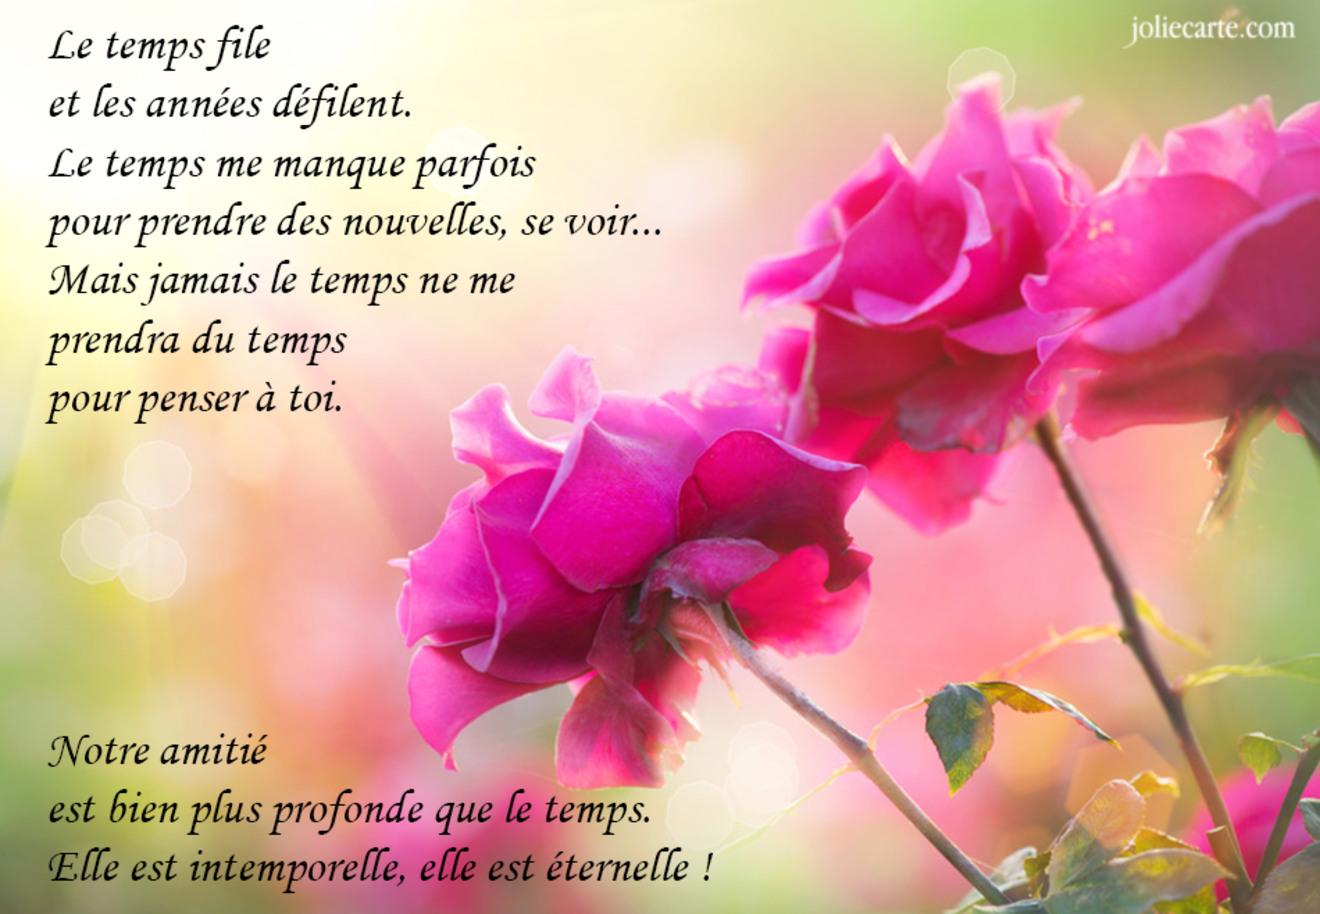 Relativ Cartes virtuelles amitie poeme - Joliecarte XL23